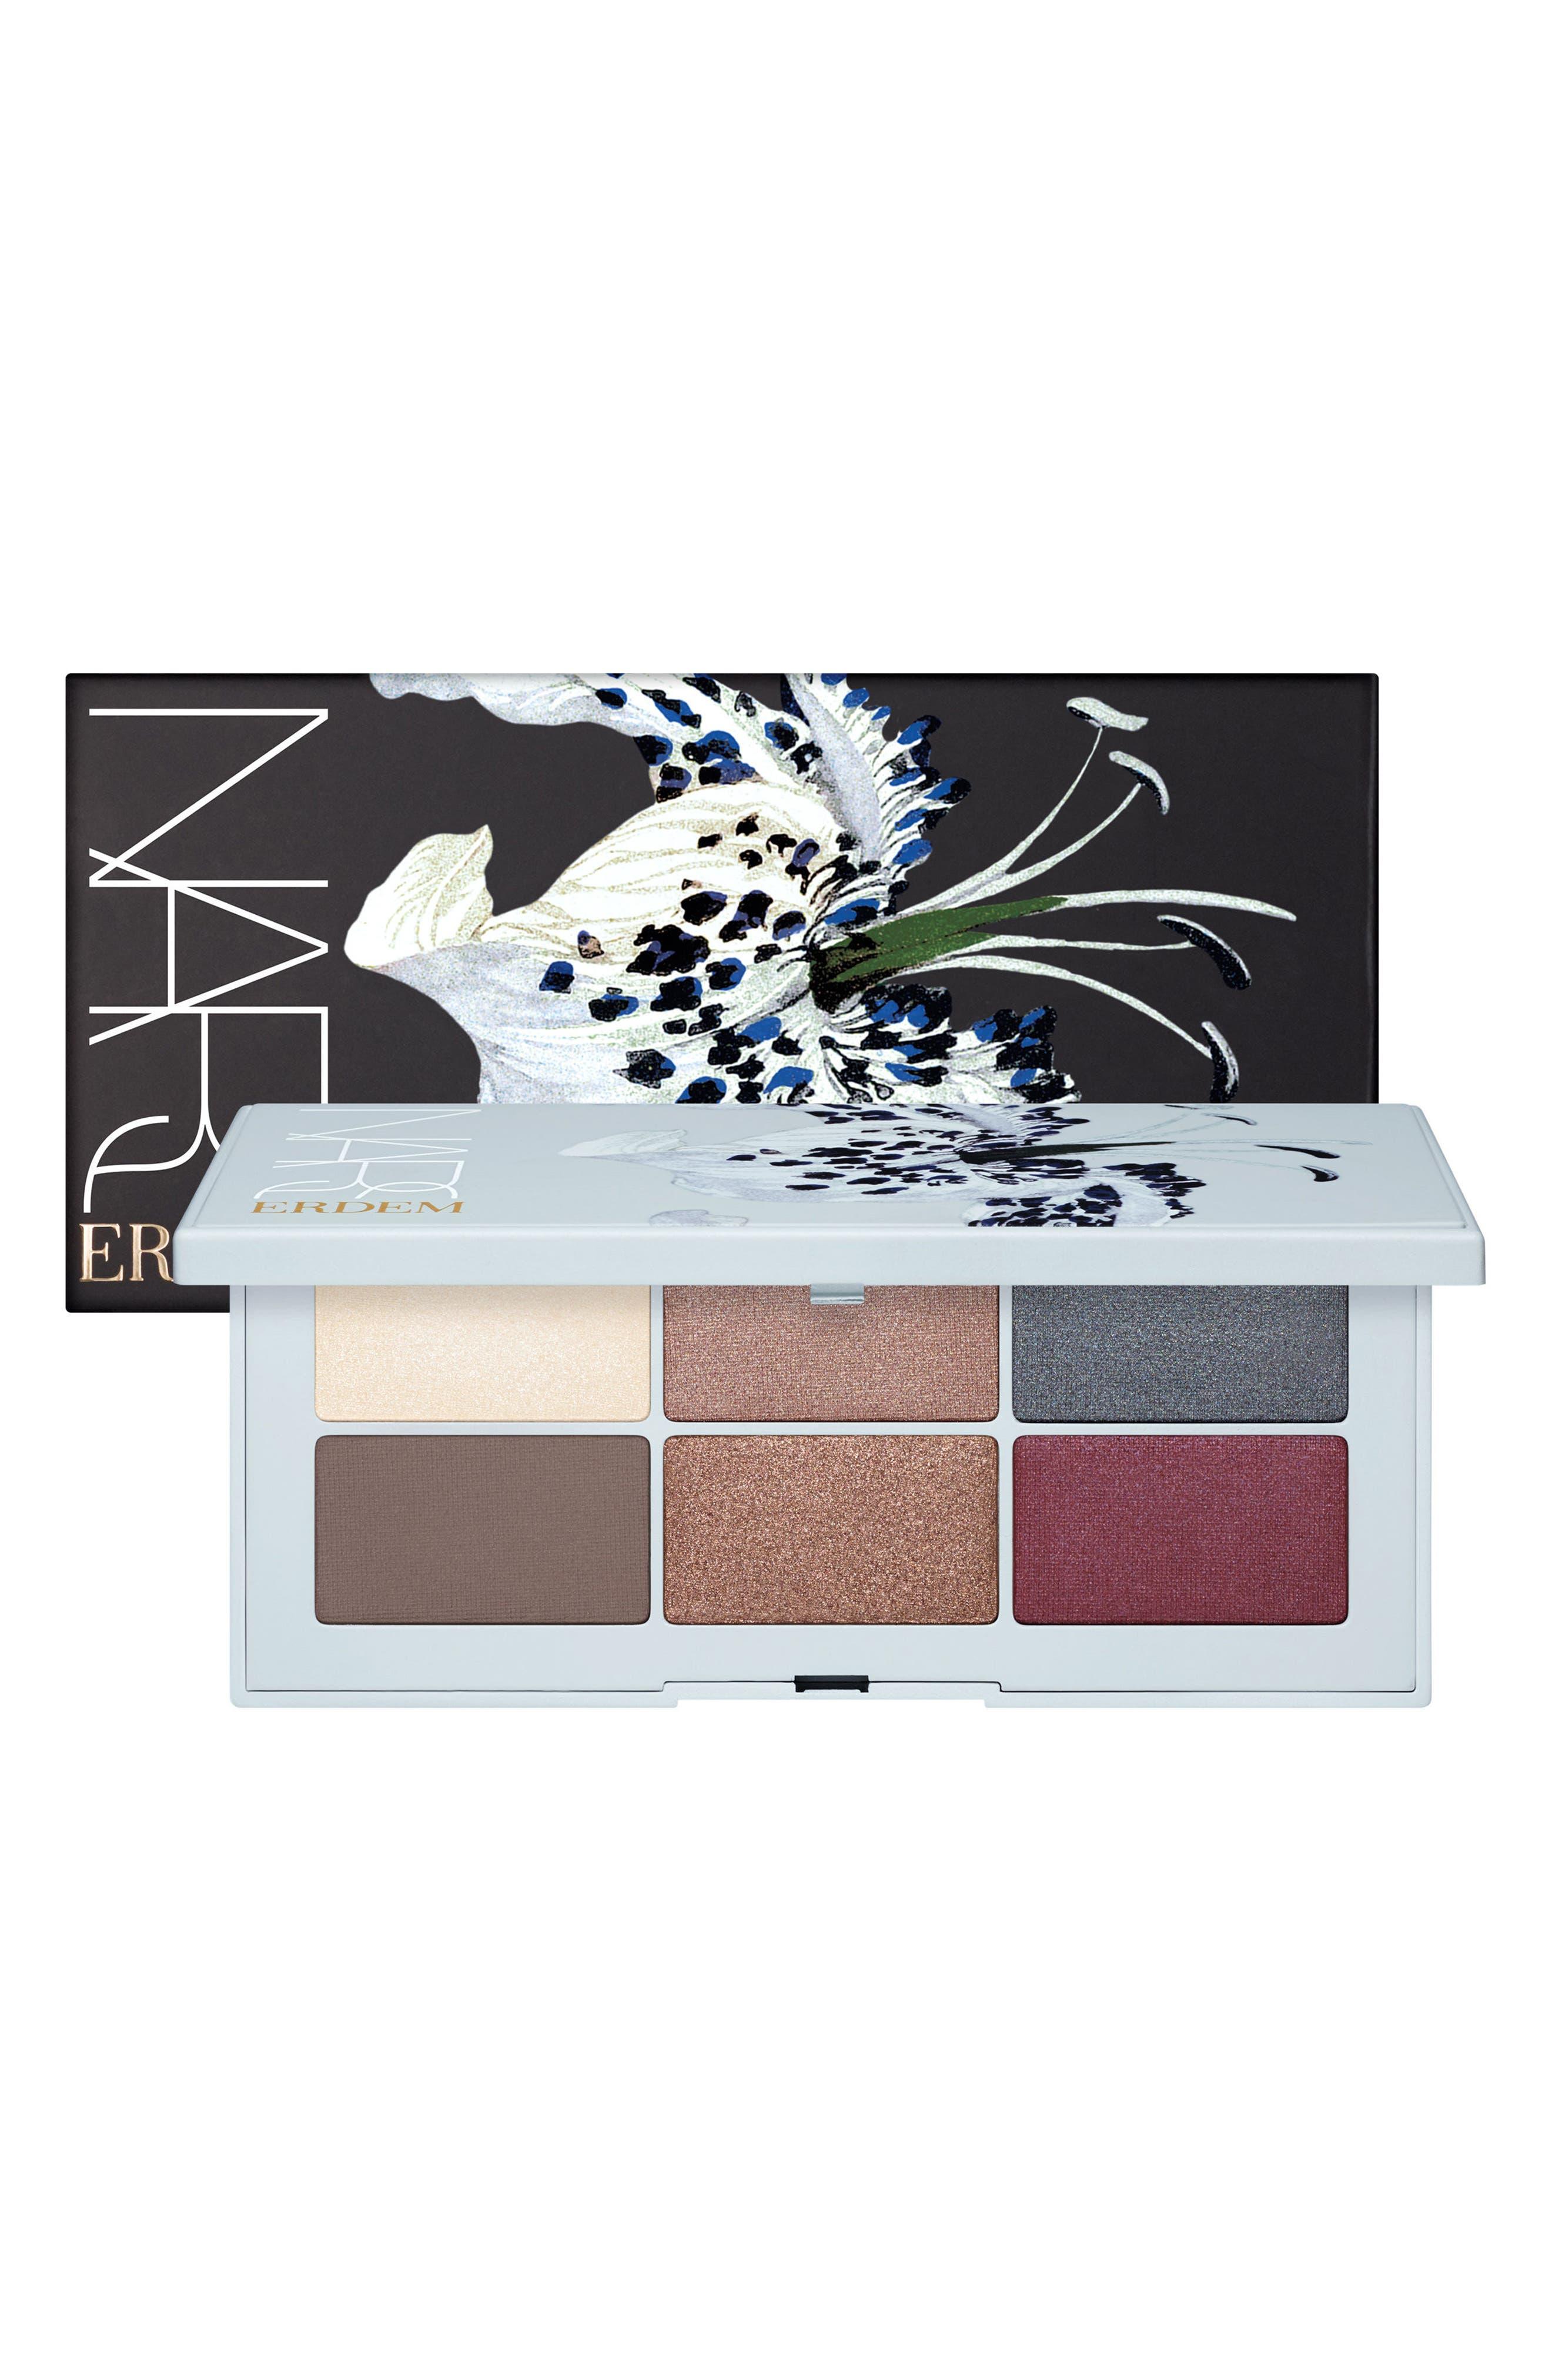 x Erdem Strange Flowers Eyeshadow Palette,                             Alternate thumbnail 2, color,                             000